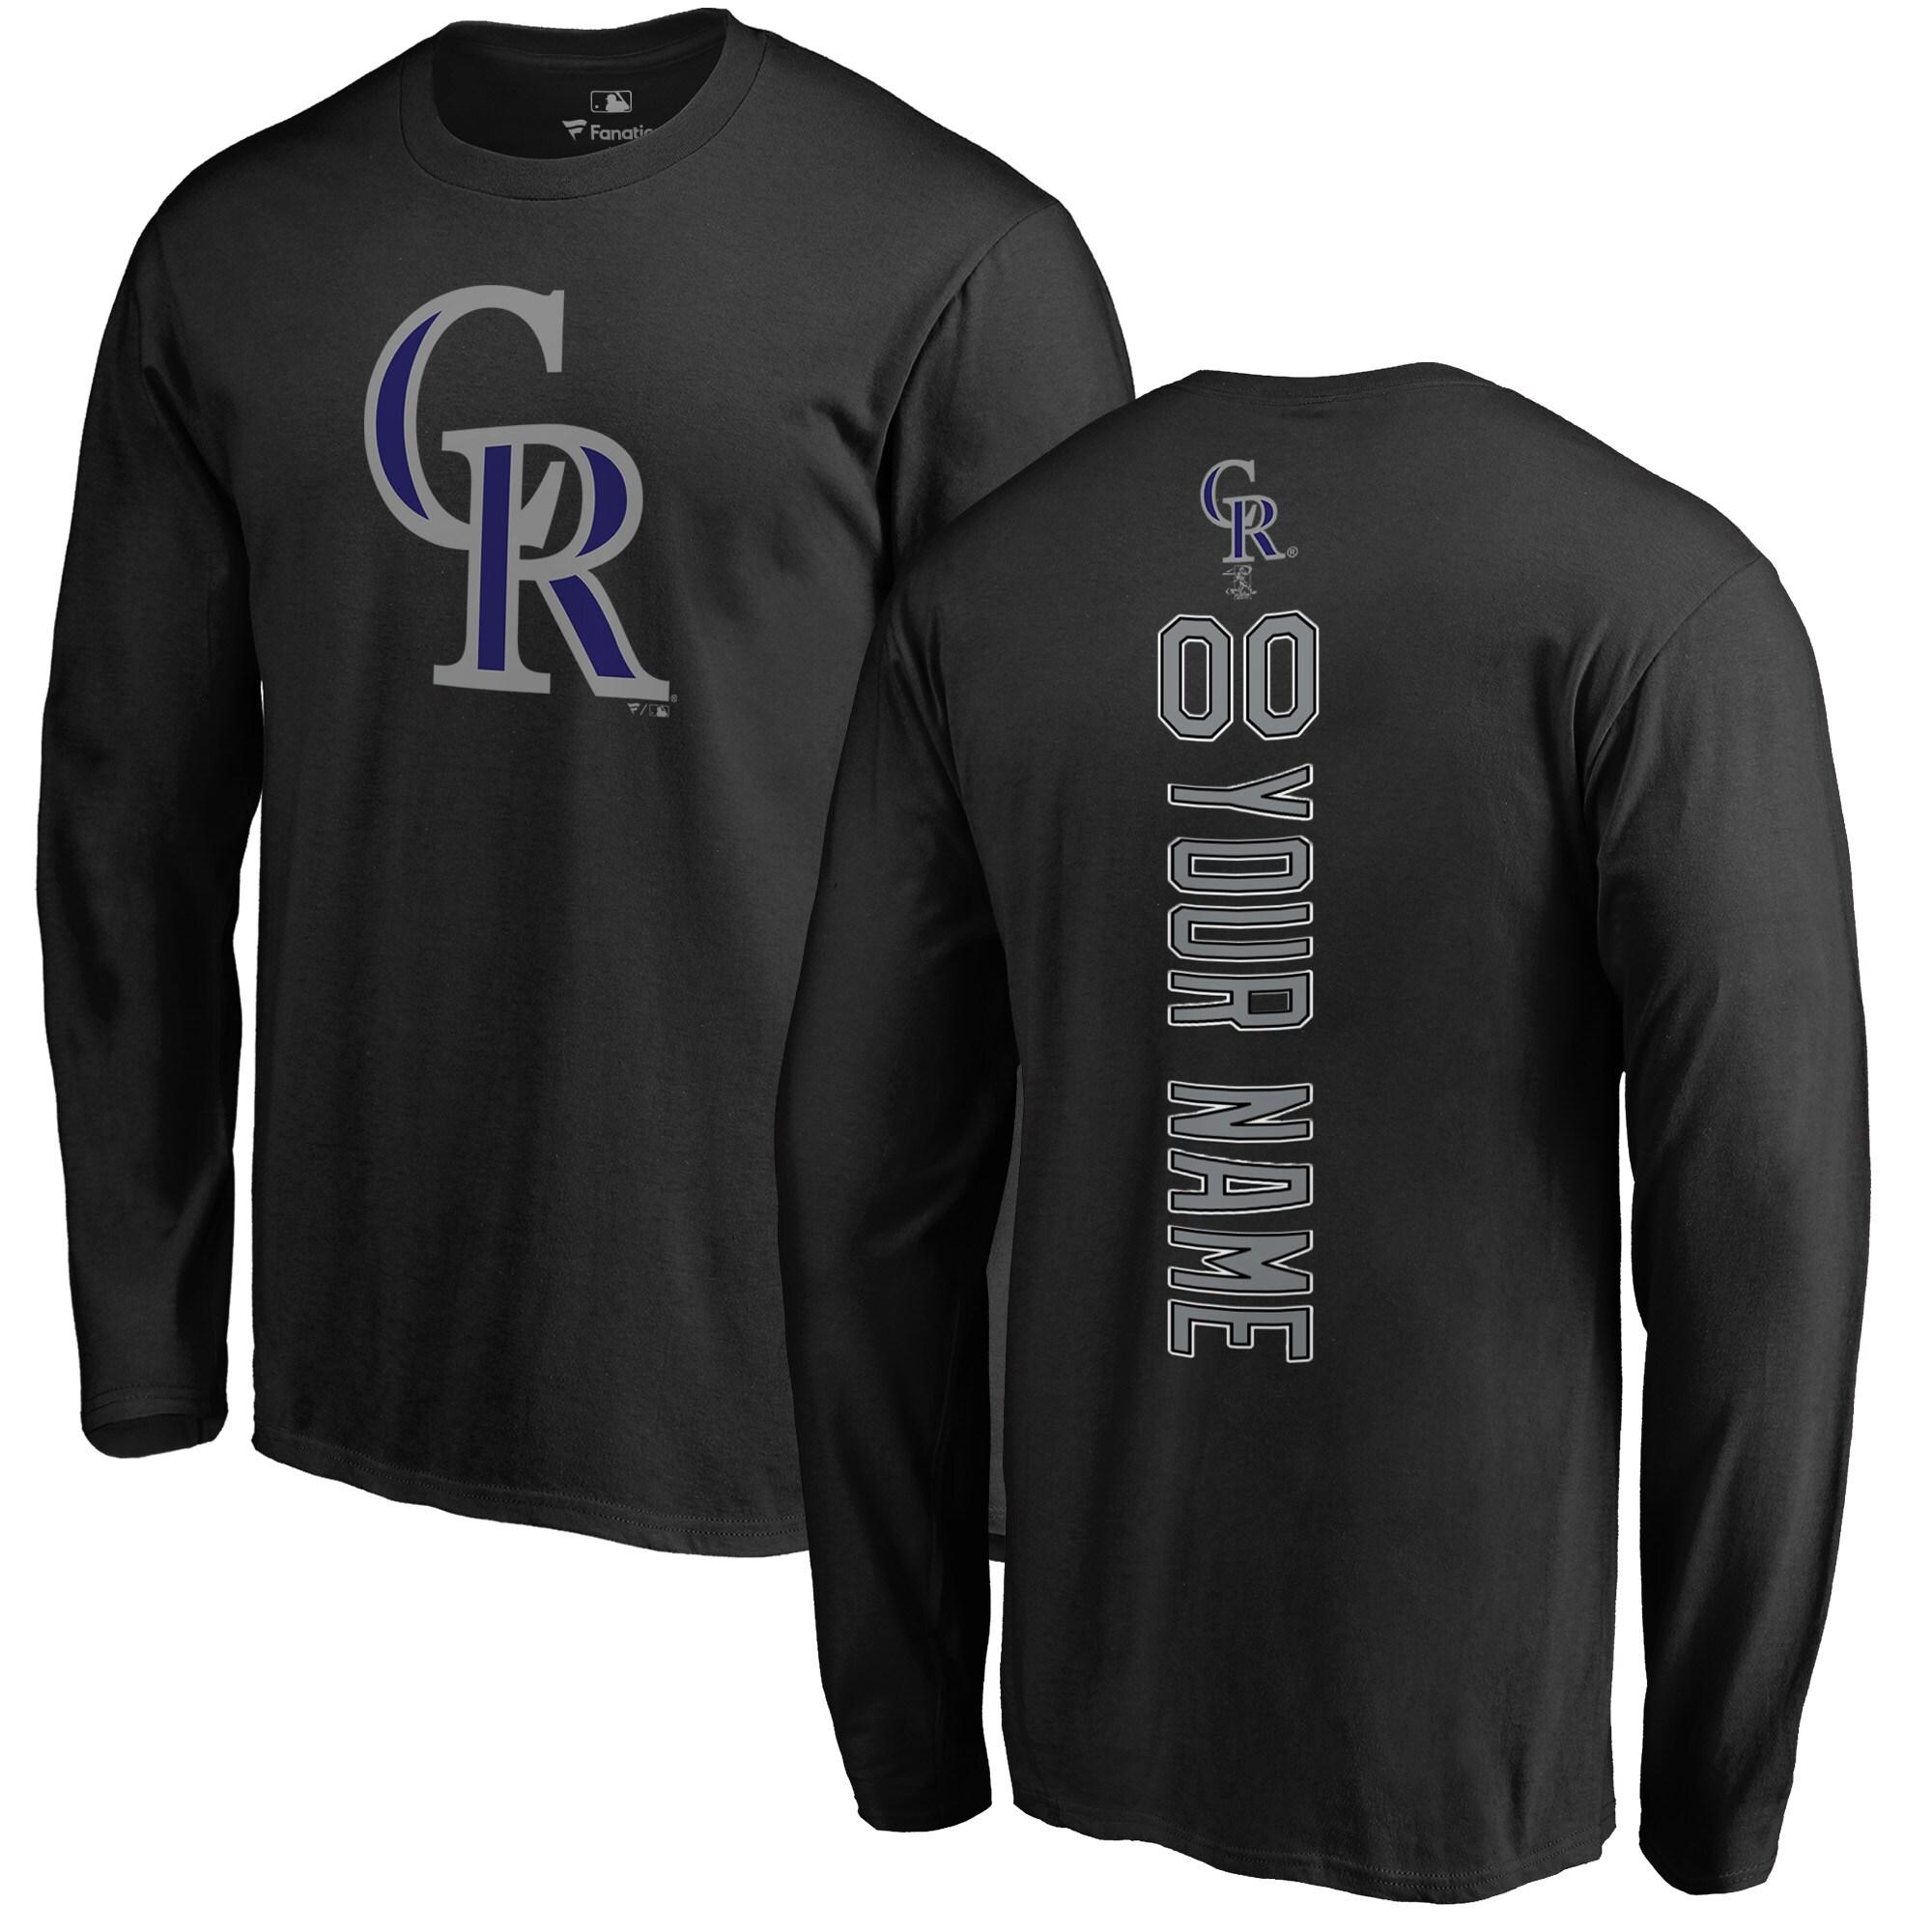 Colorado Rockies Fanatics Branded Personalized Playmaker Long Sleeve T-Shirt - Black